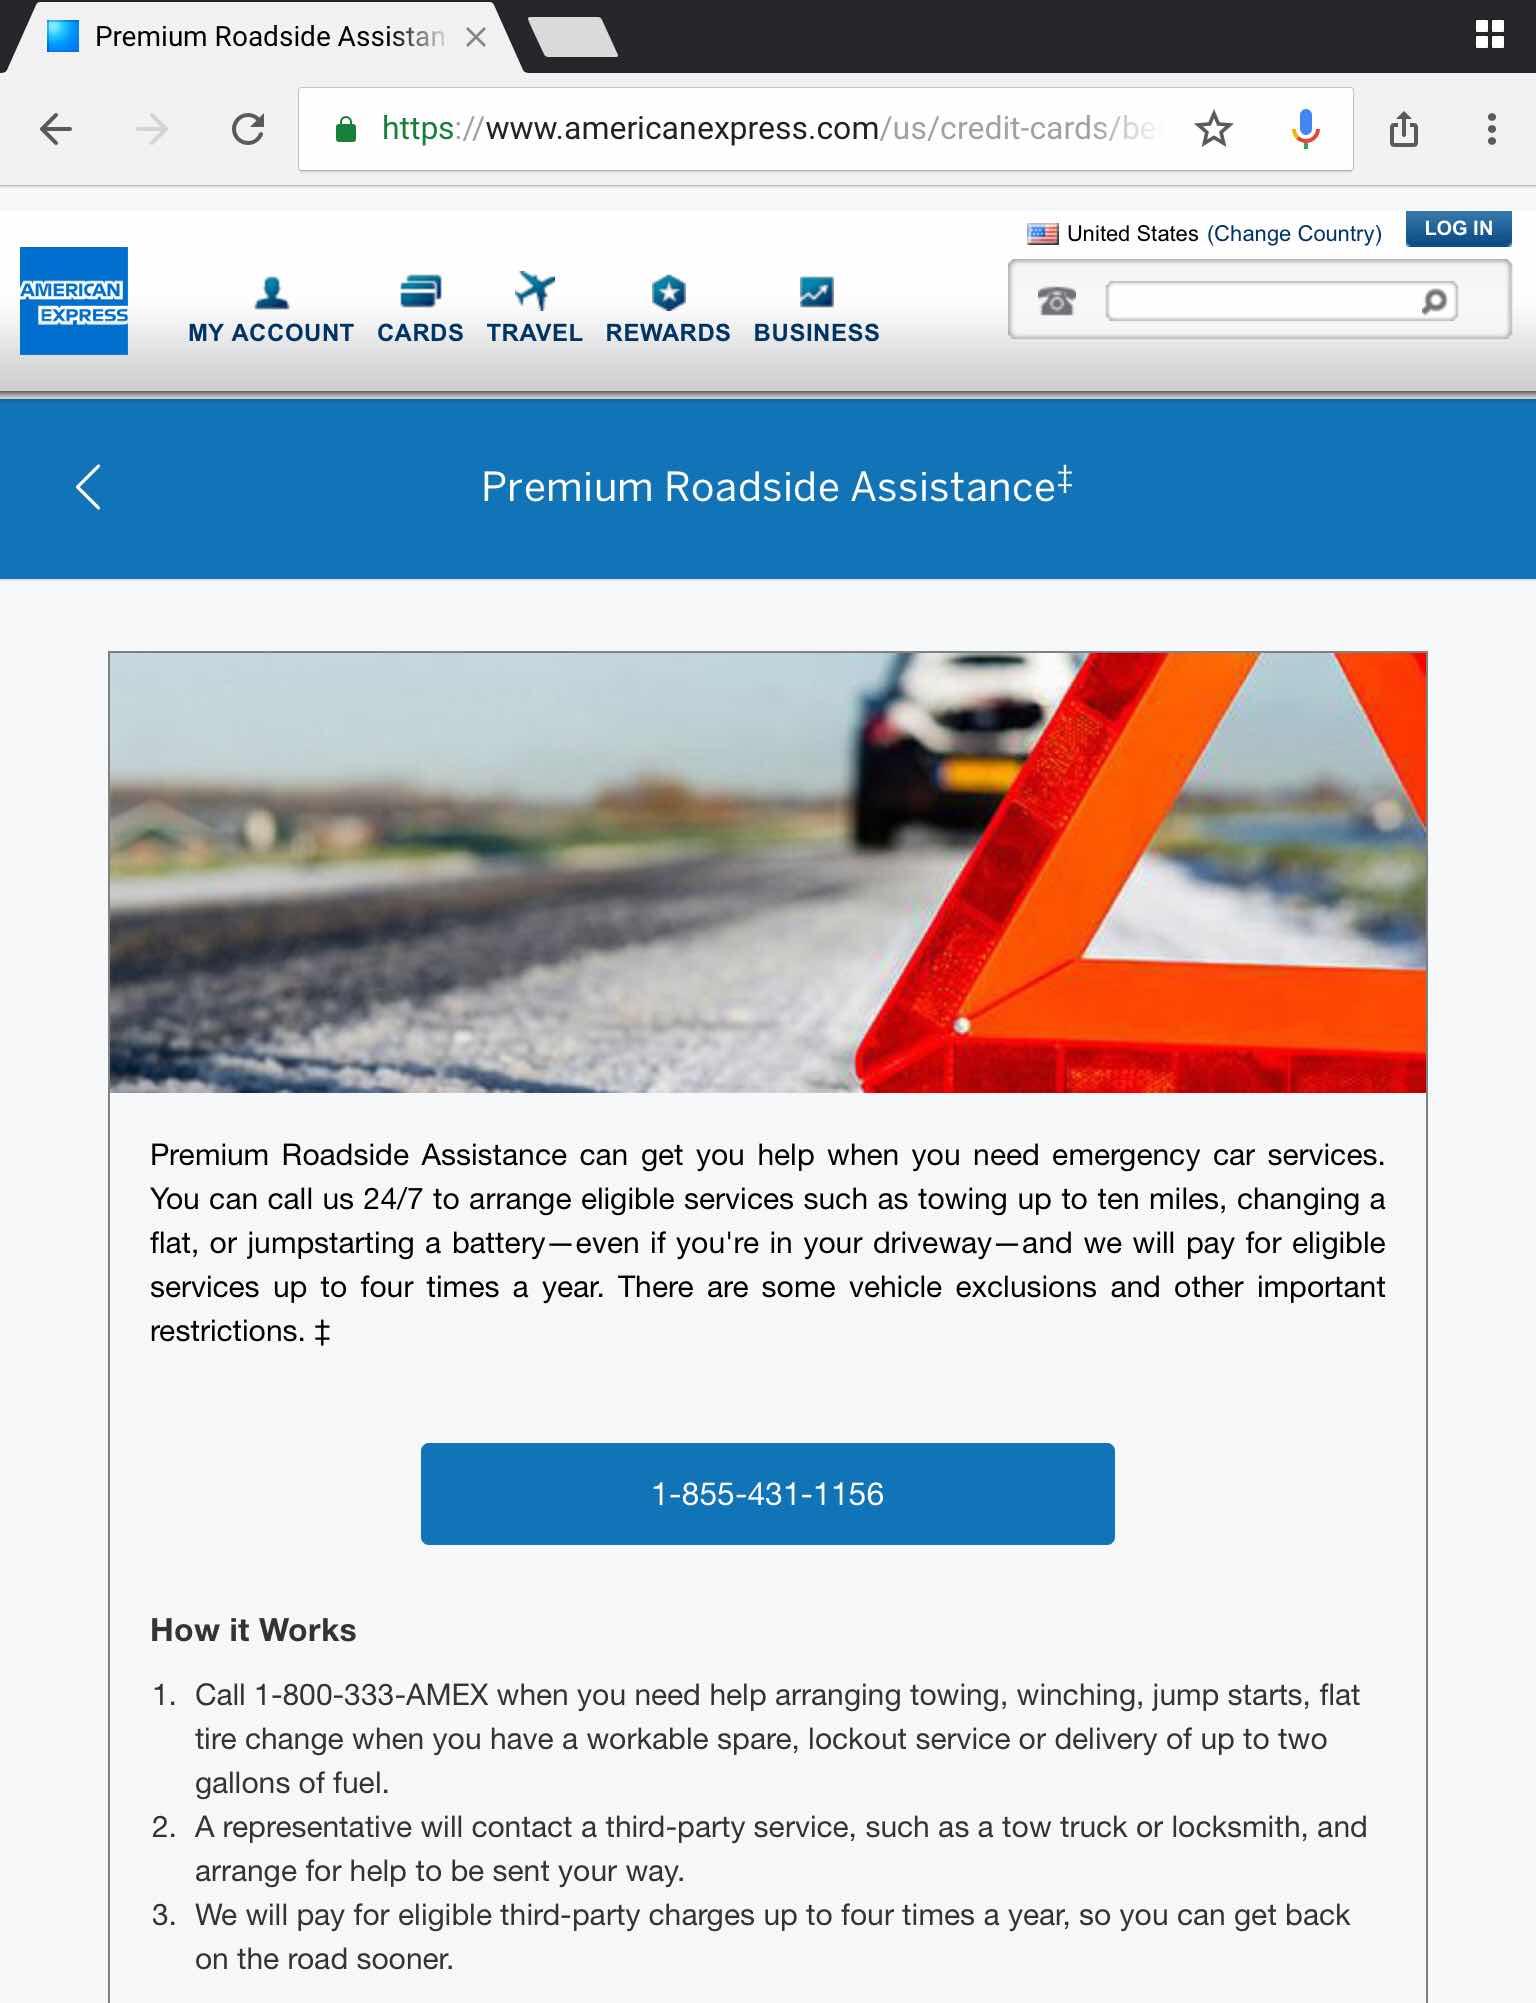 American Express Premium Roadside Assistance